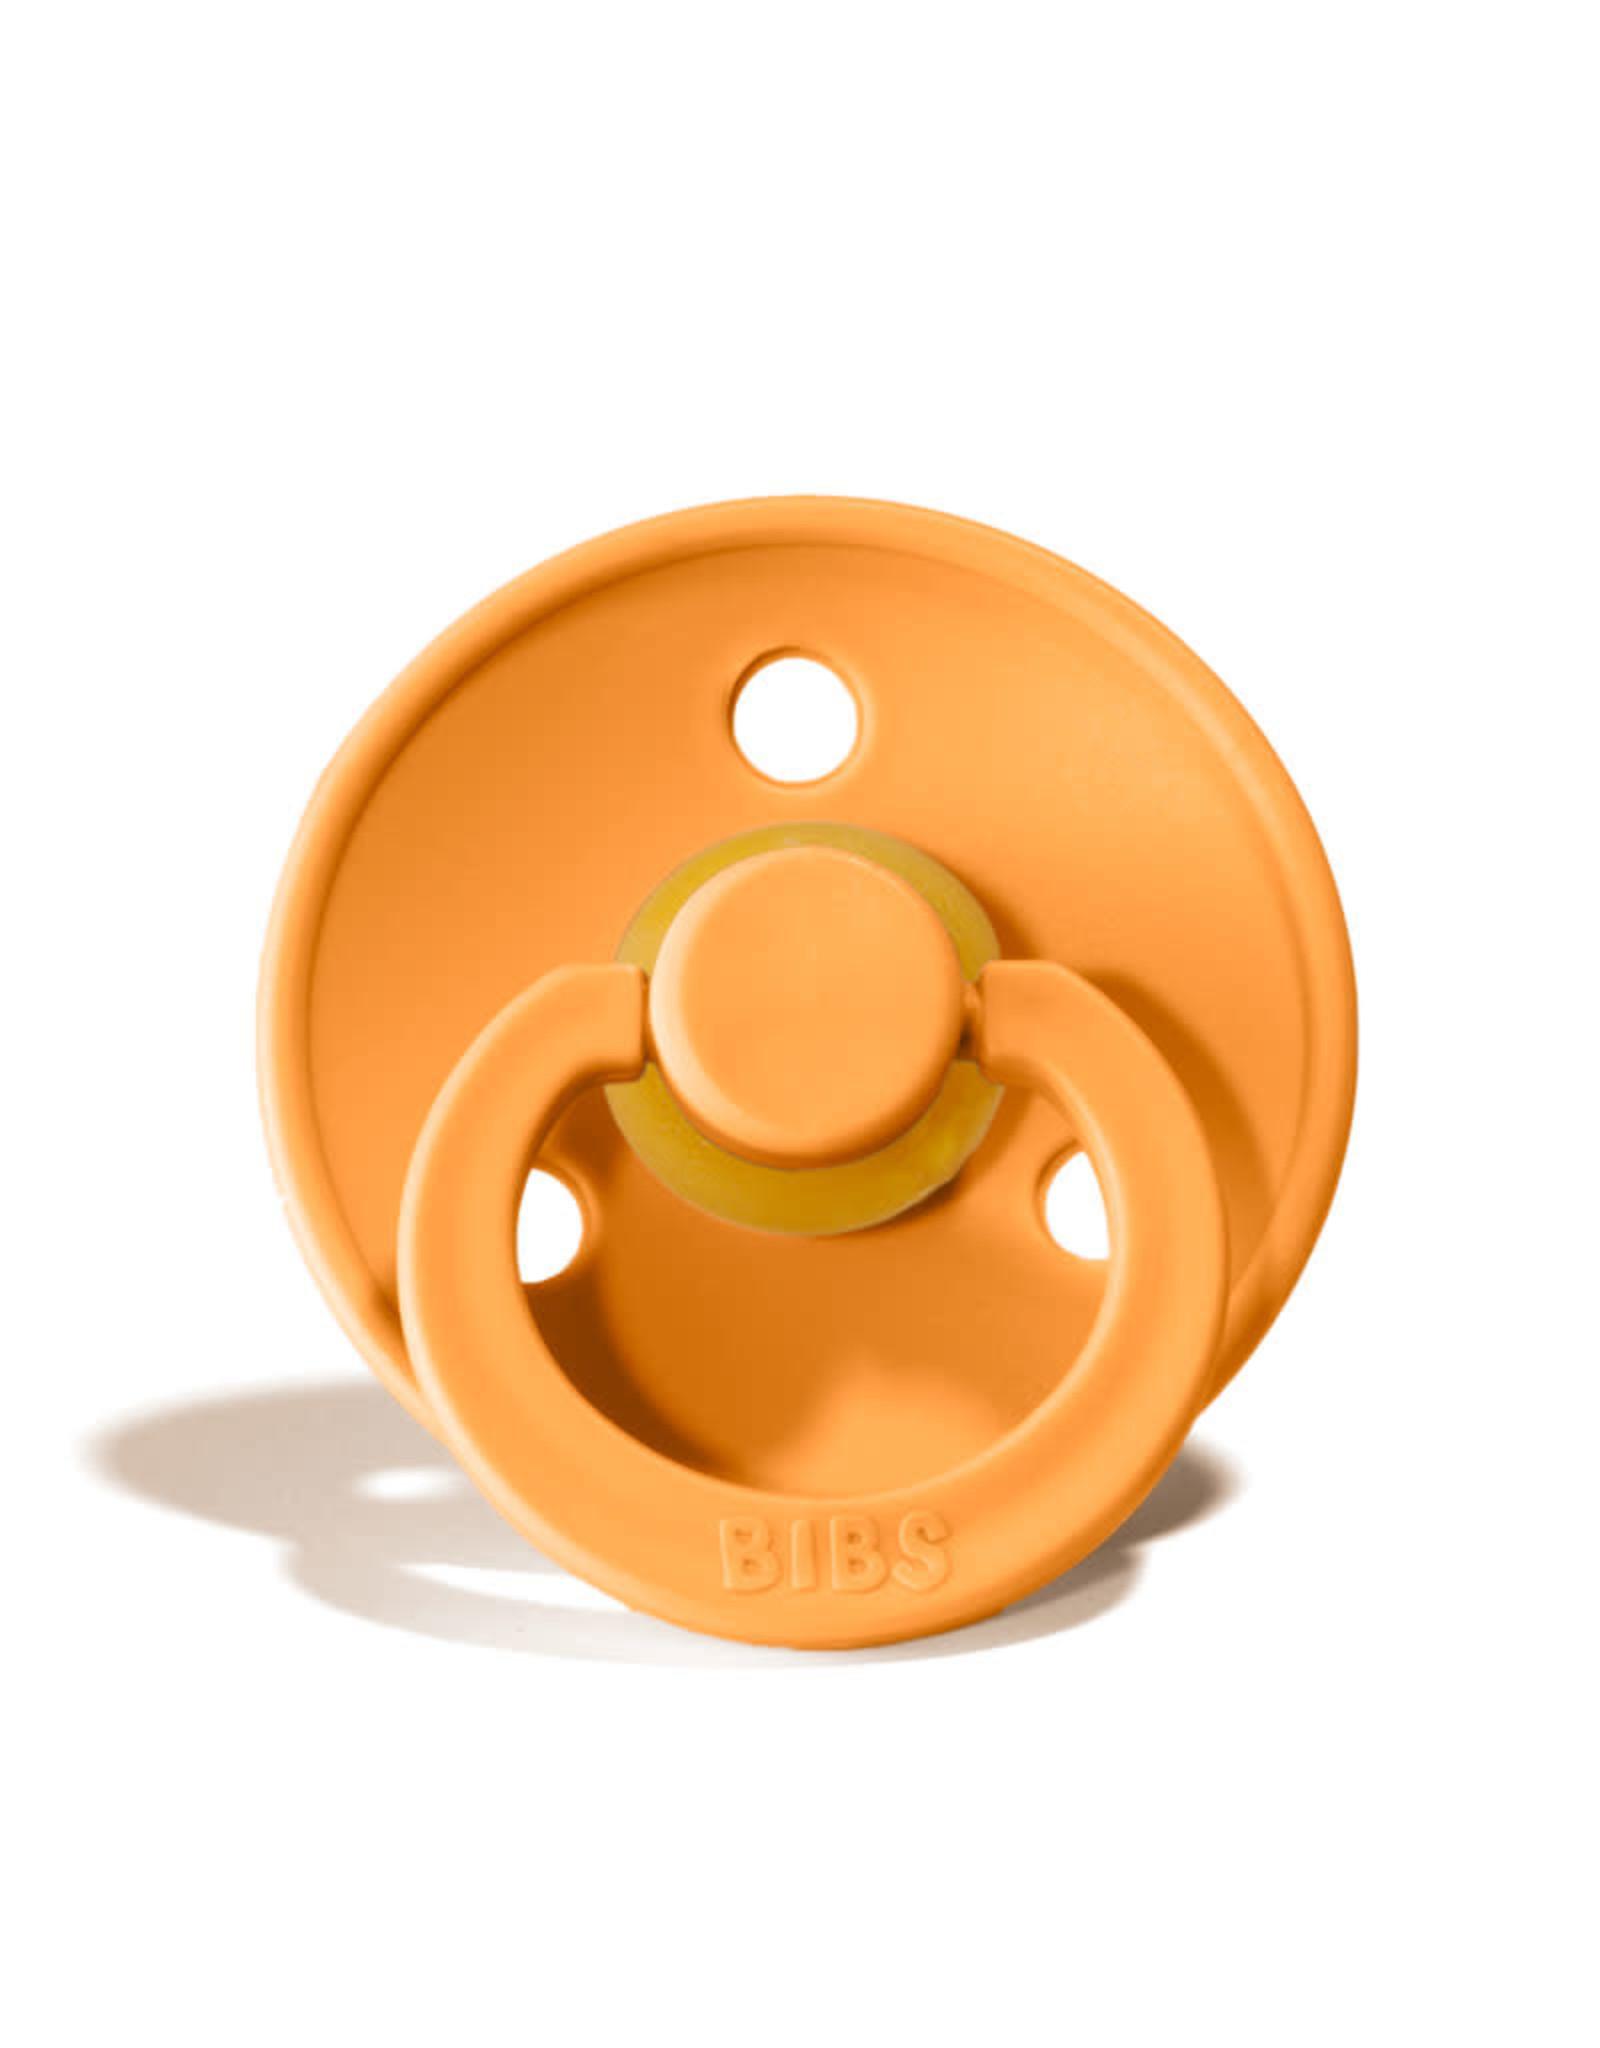 Bibs Fopspeen Apricot maat 2